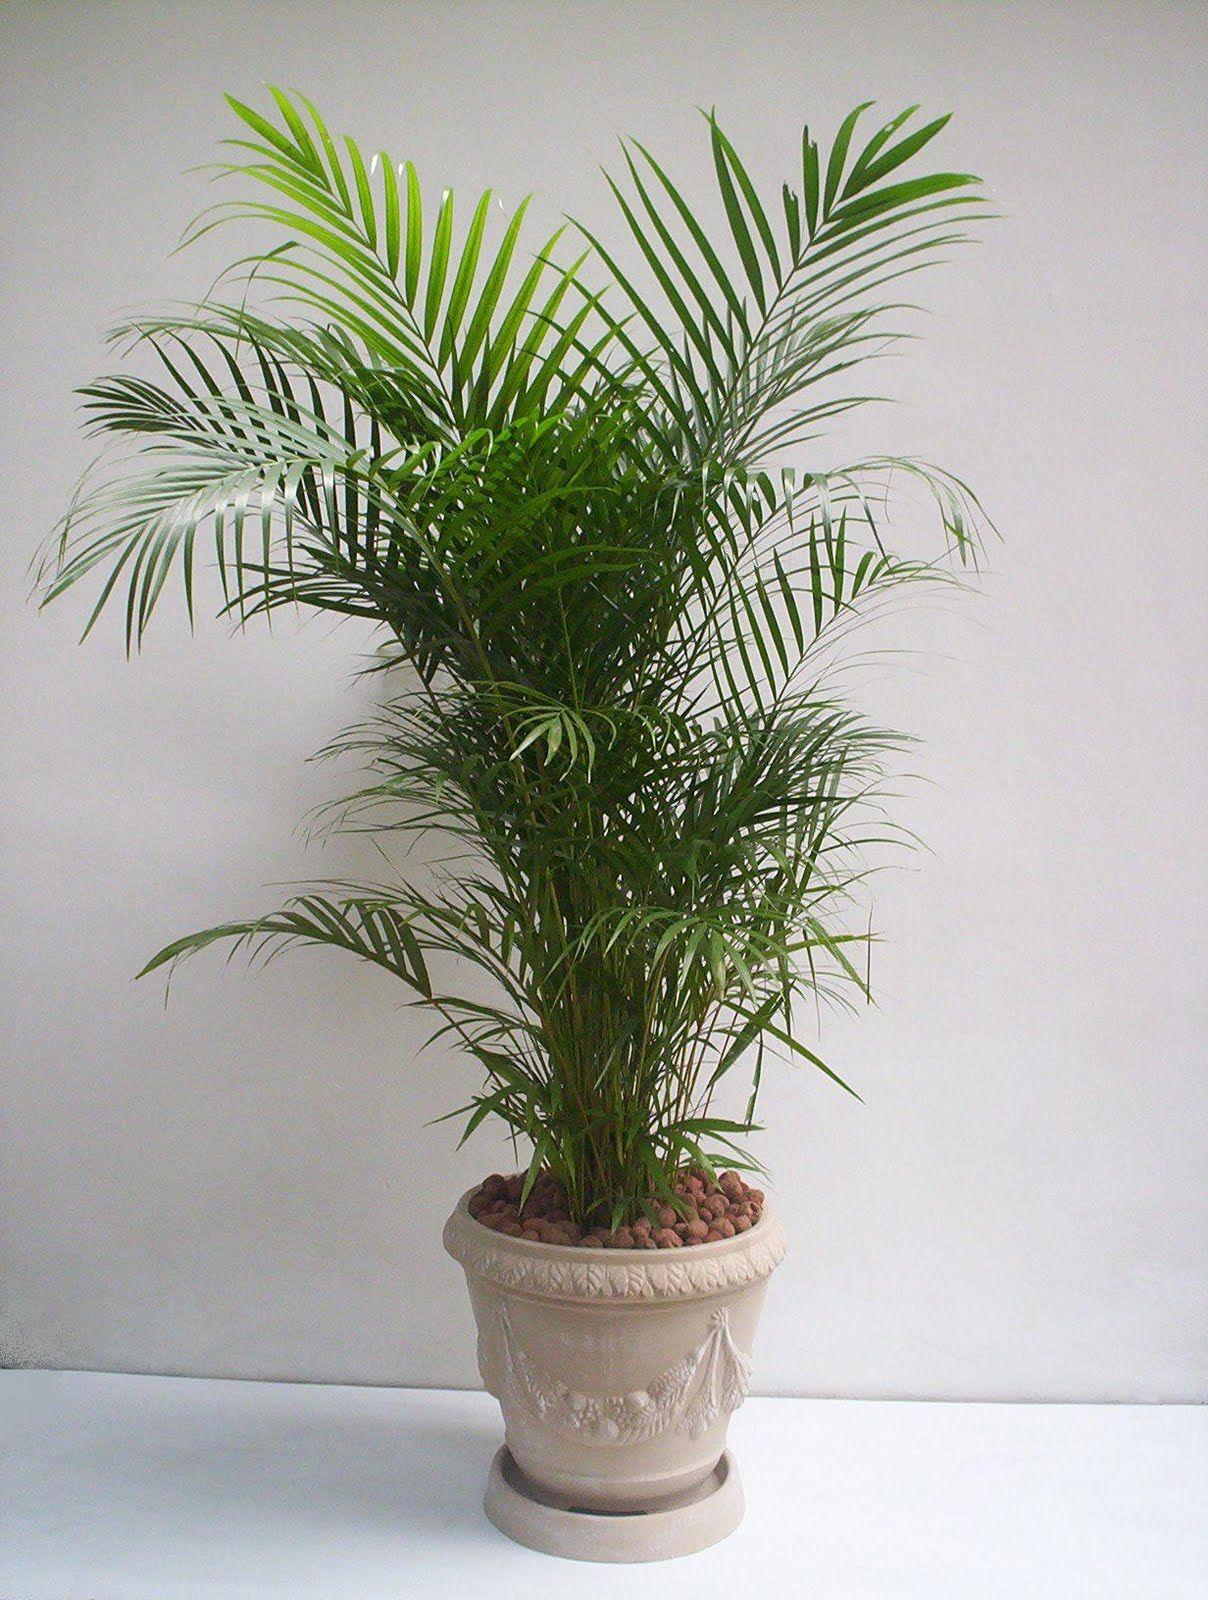 Plantas Ideais Para Ambientes Internos Palmeira Areca Dypsis